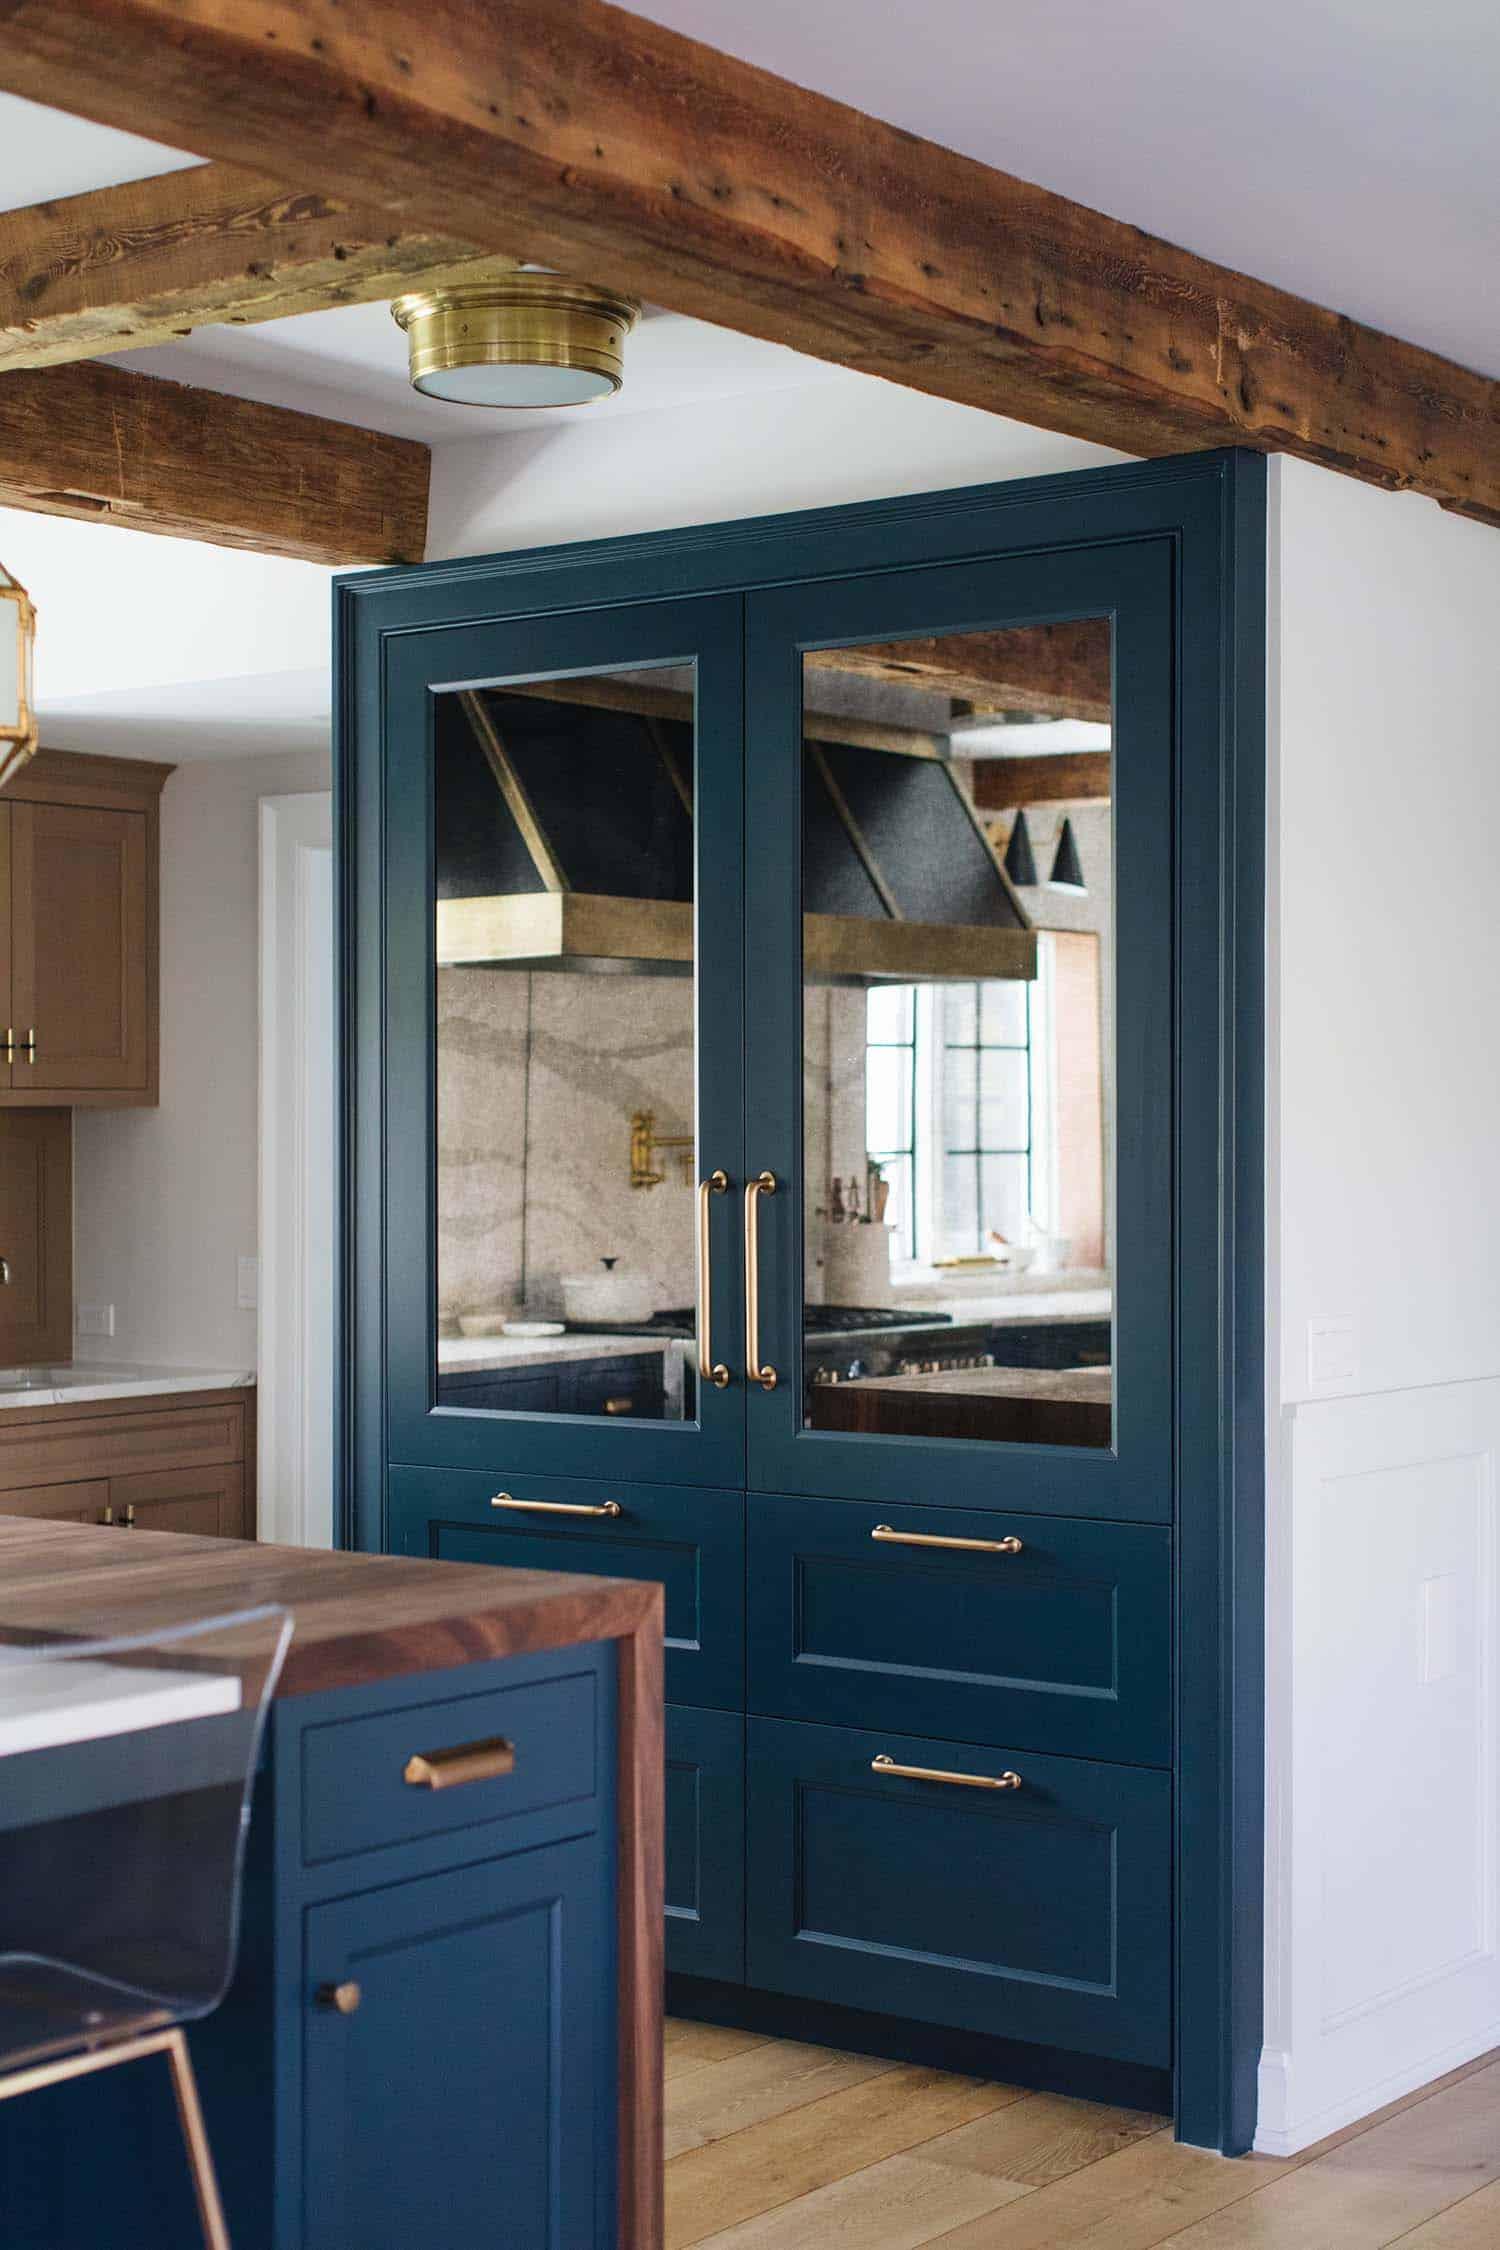 Modern Farmhouse Style-Jean Stoffer Design-51-1 Kindesign